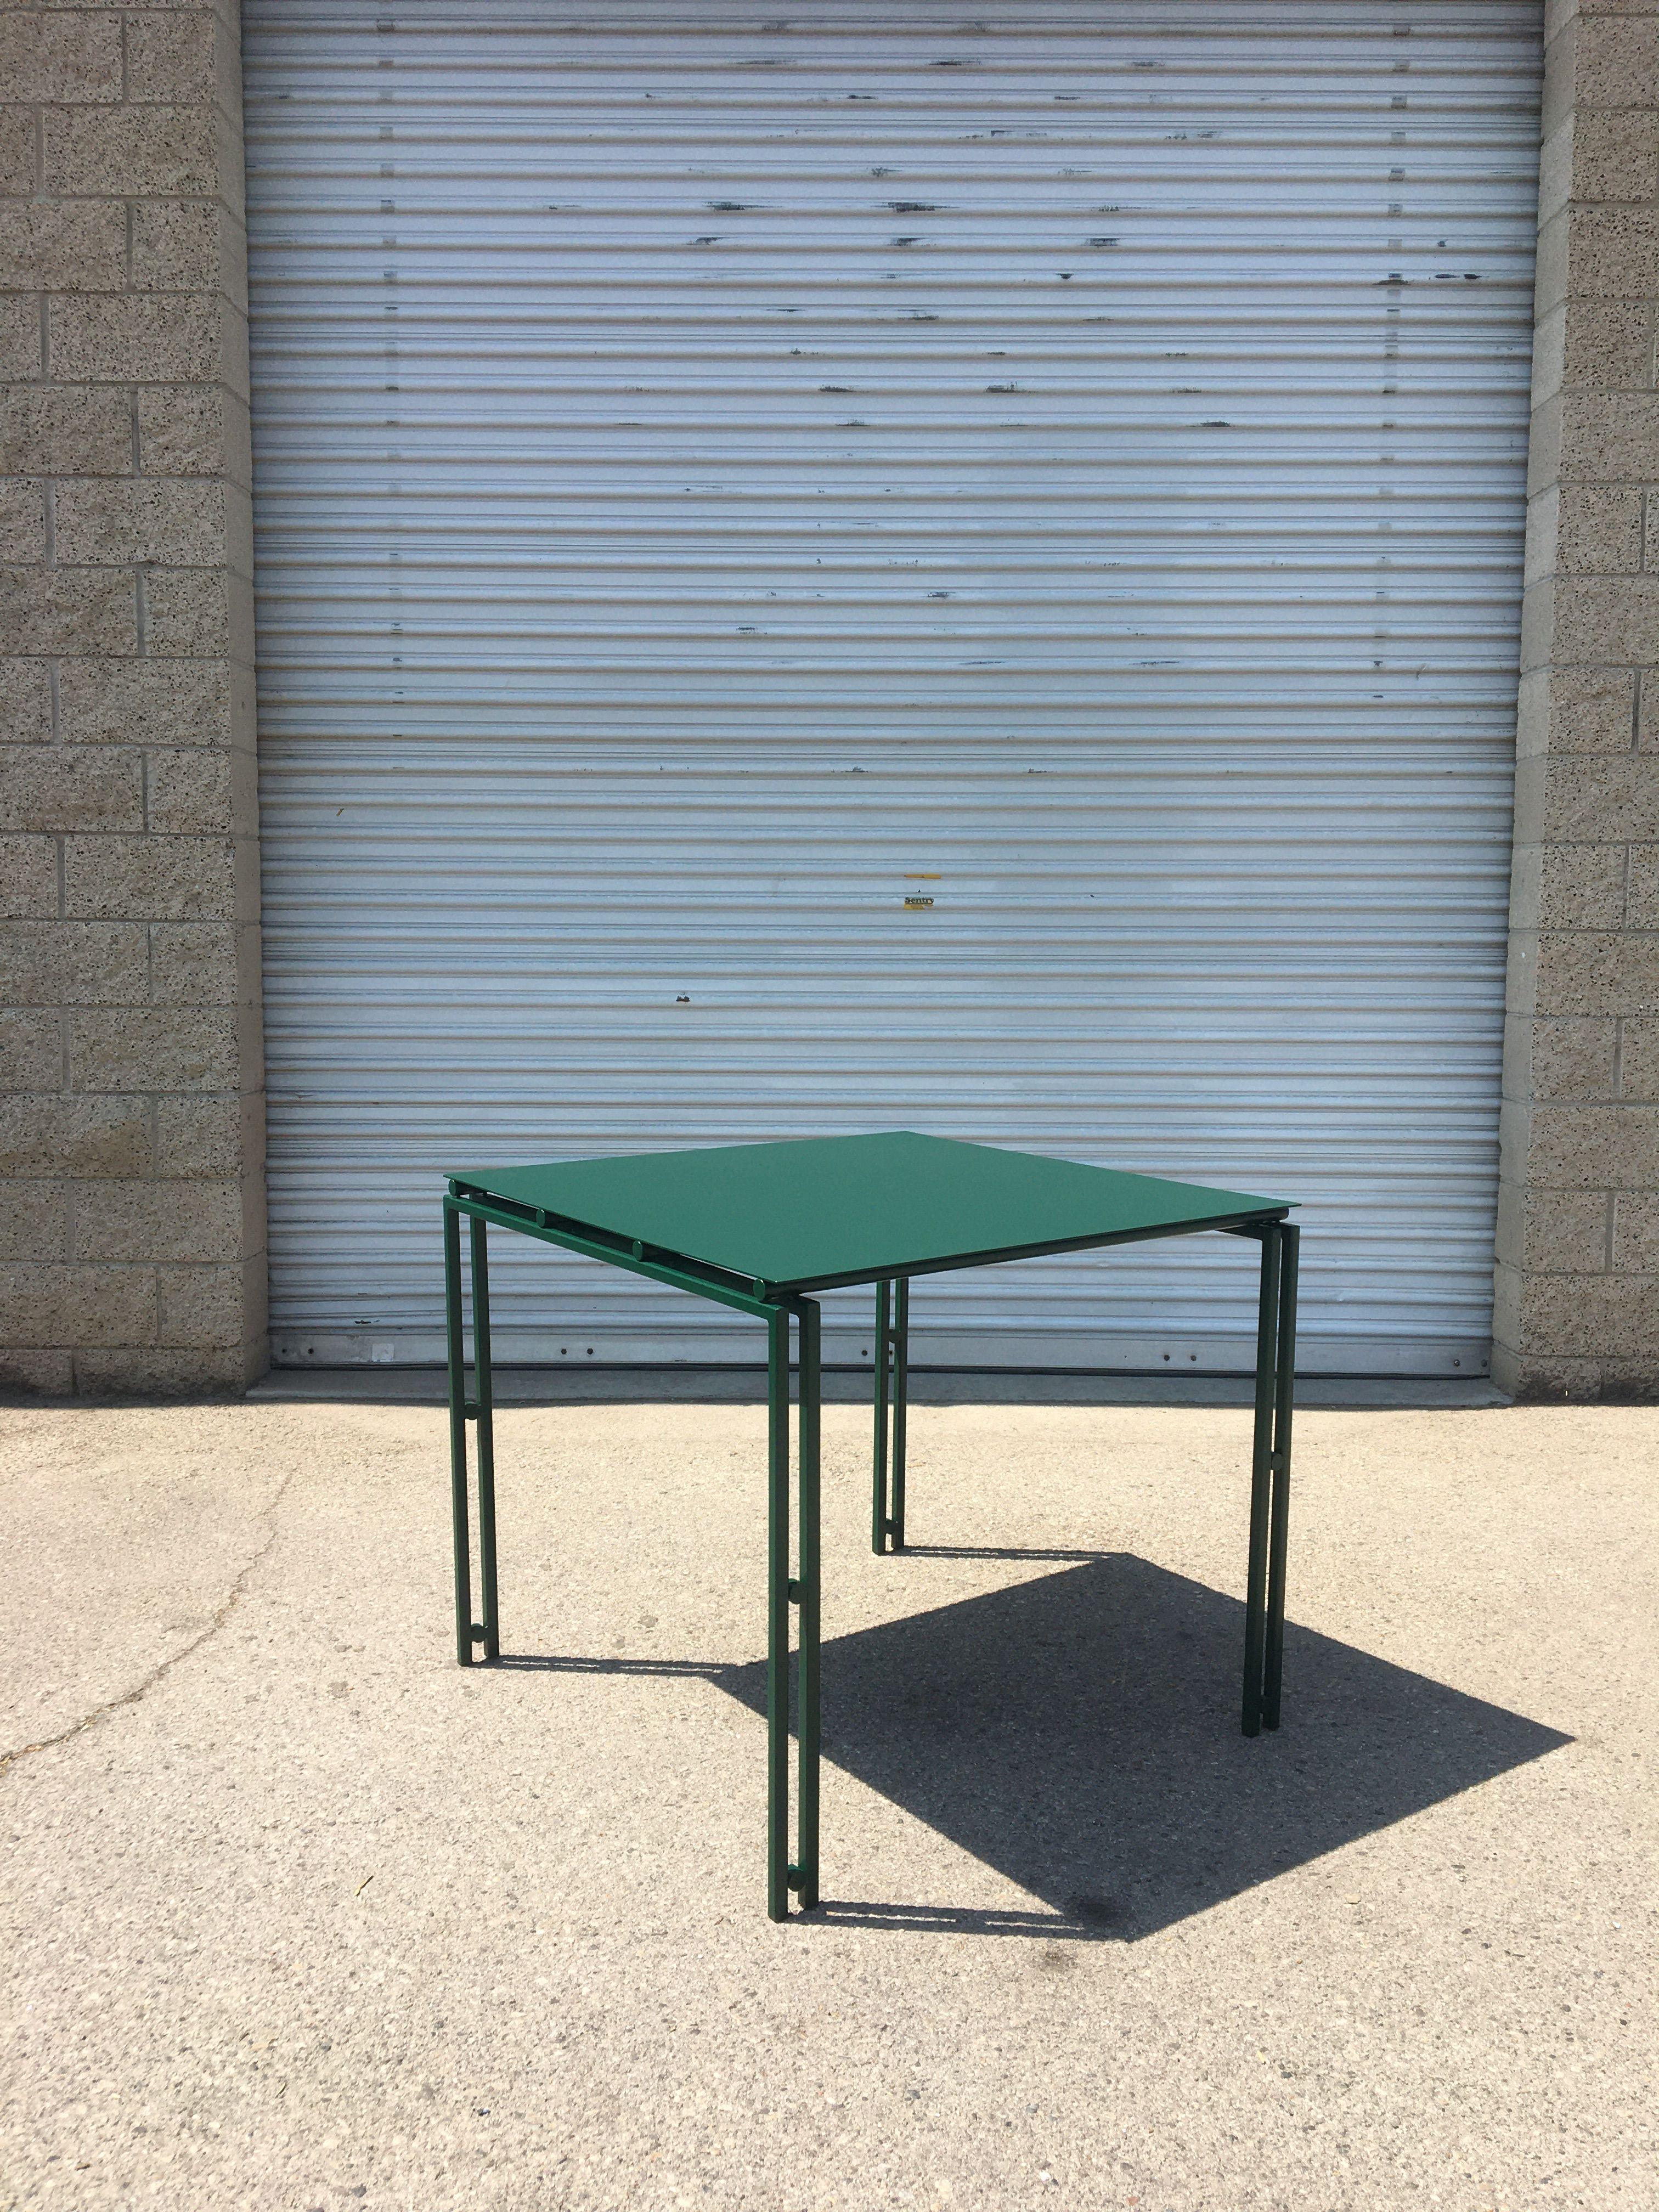 Suspension Metal Set - Breakfast Size product image 11